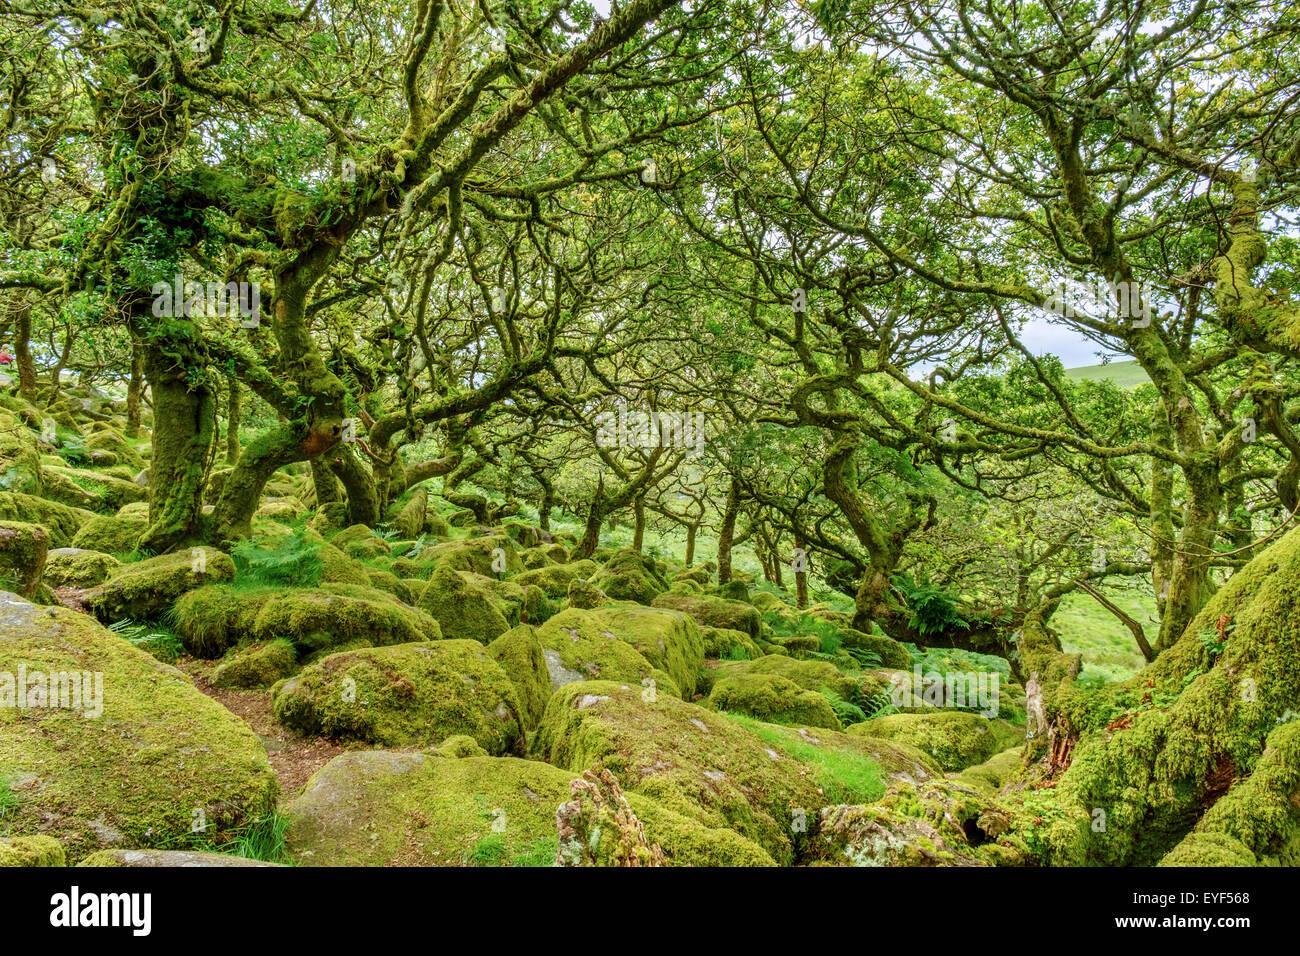 Wistman's Wood, a high-altitude oakwood (Quercus robur), near Two Bridges, Dartmoor National Park, Devon, England, - Stock Image